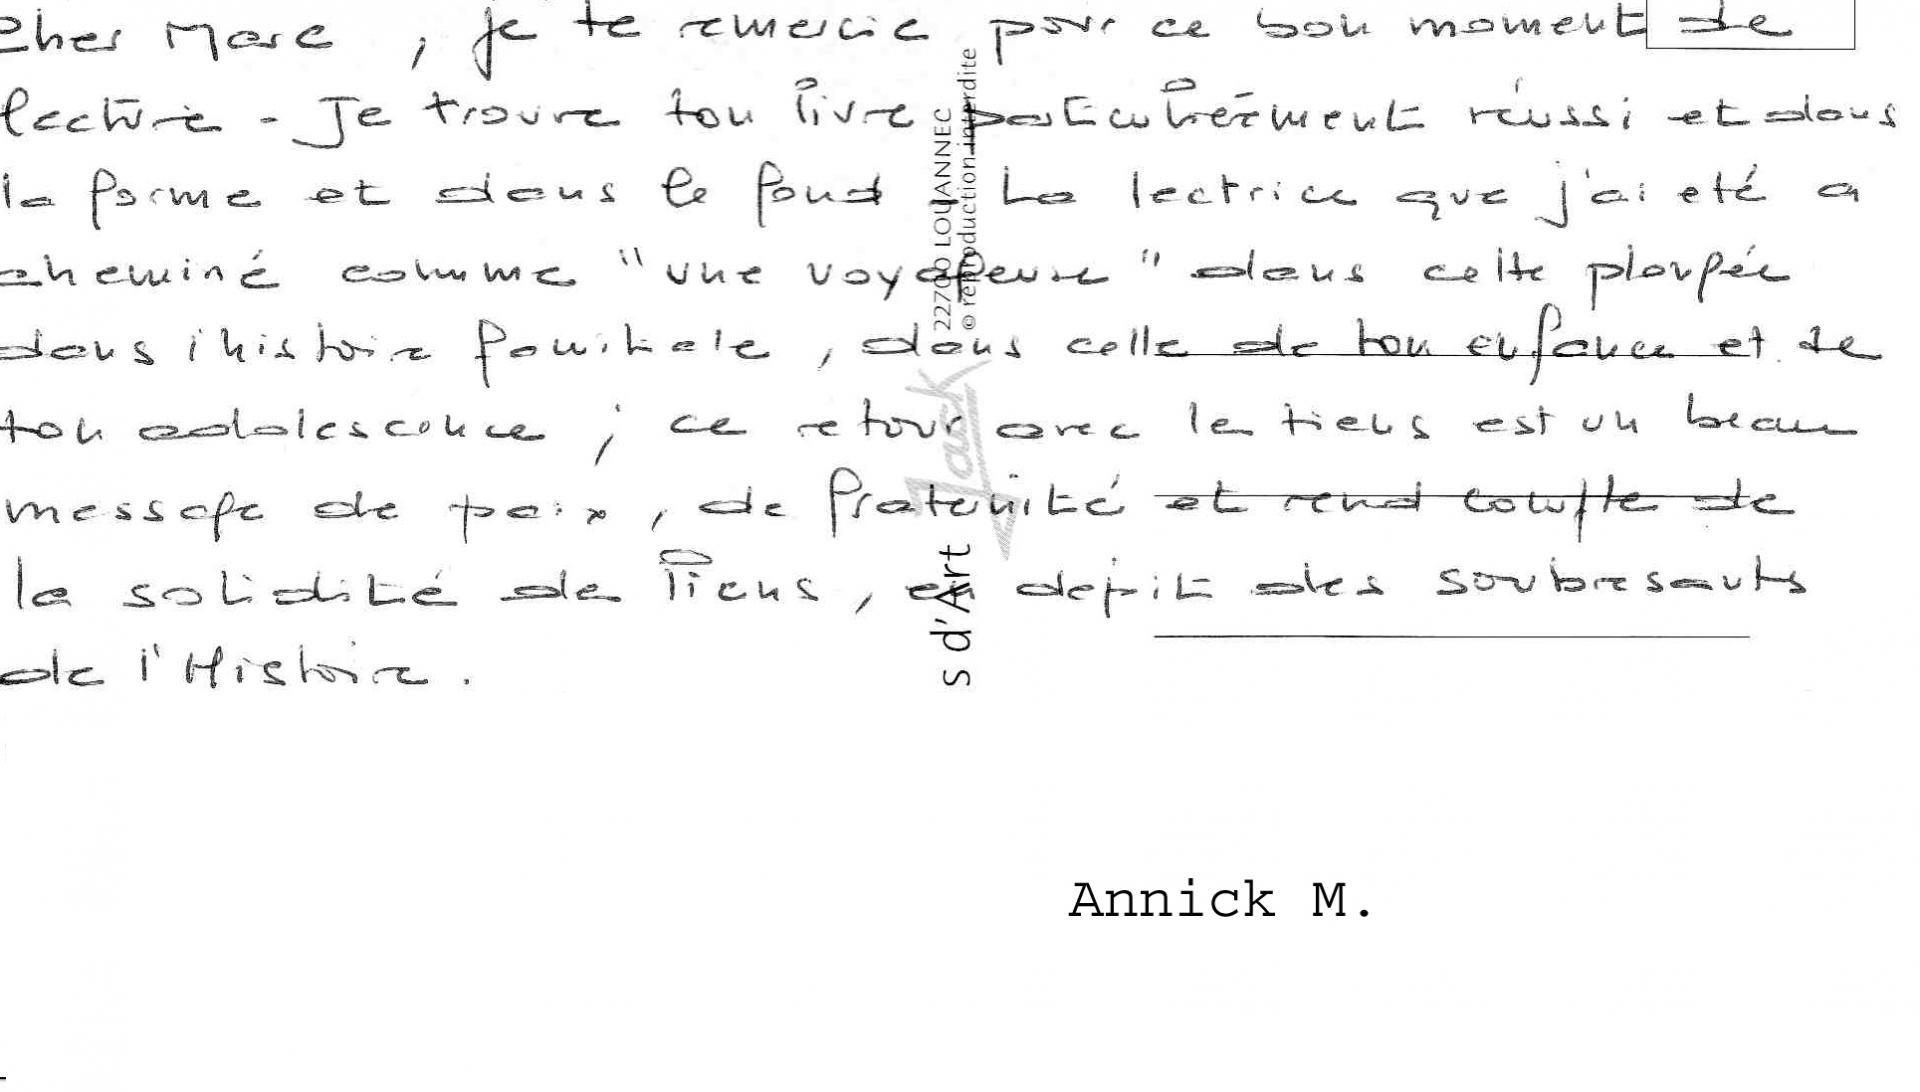 Annick M